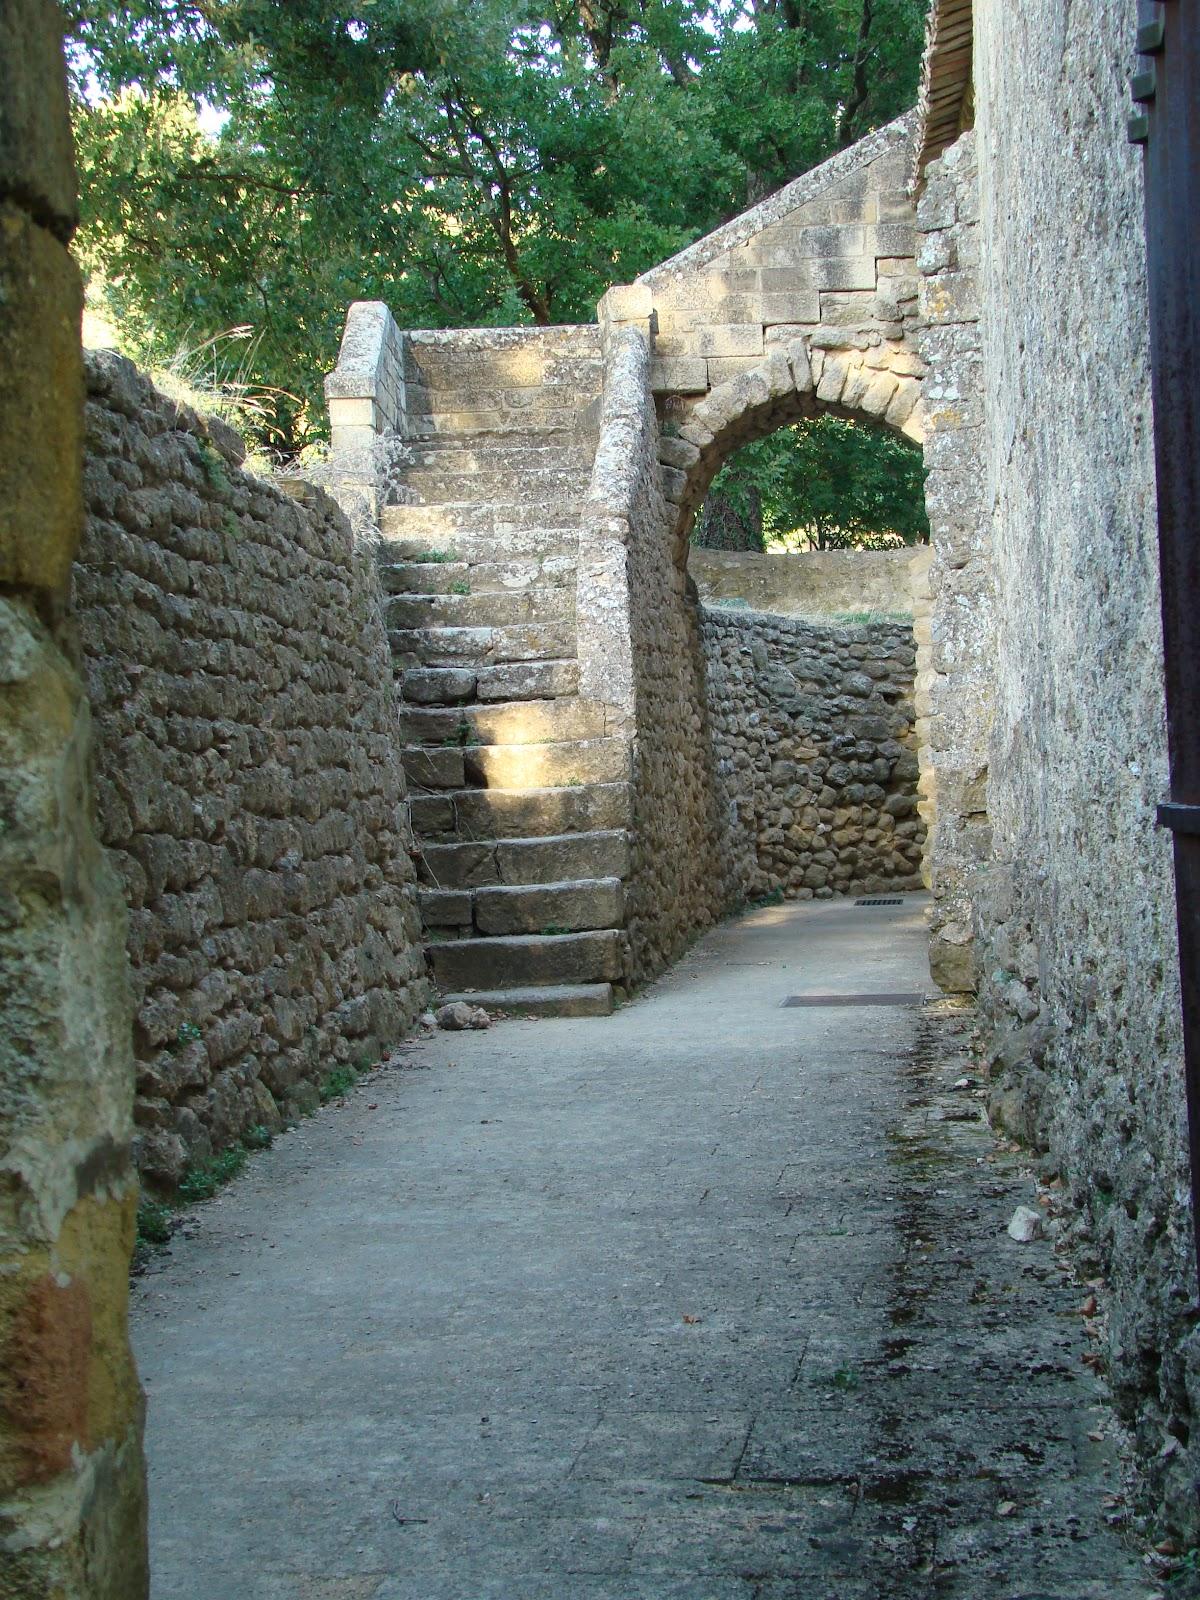 http://1.bp.blogspot.com/-hNrnWqvIKp0/T4DM6gI75lI/AAAAAAAAASk/dtlJibG_uOw/s1600/Cucuron+stone+passageways.JPG